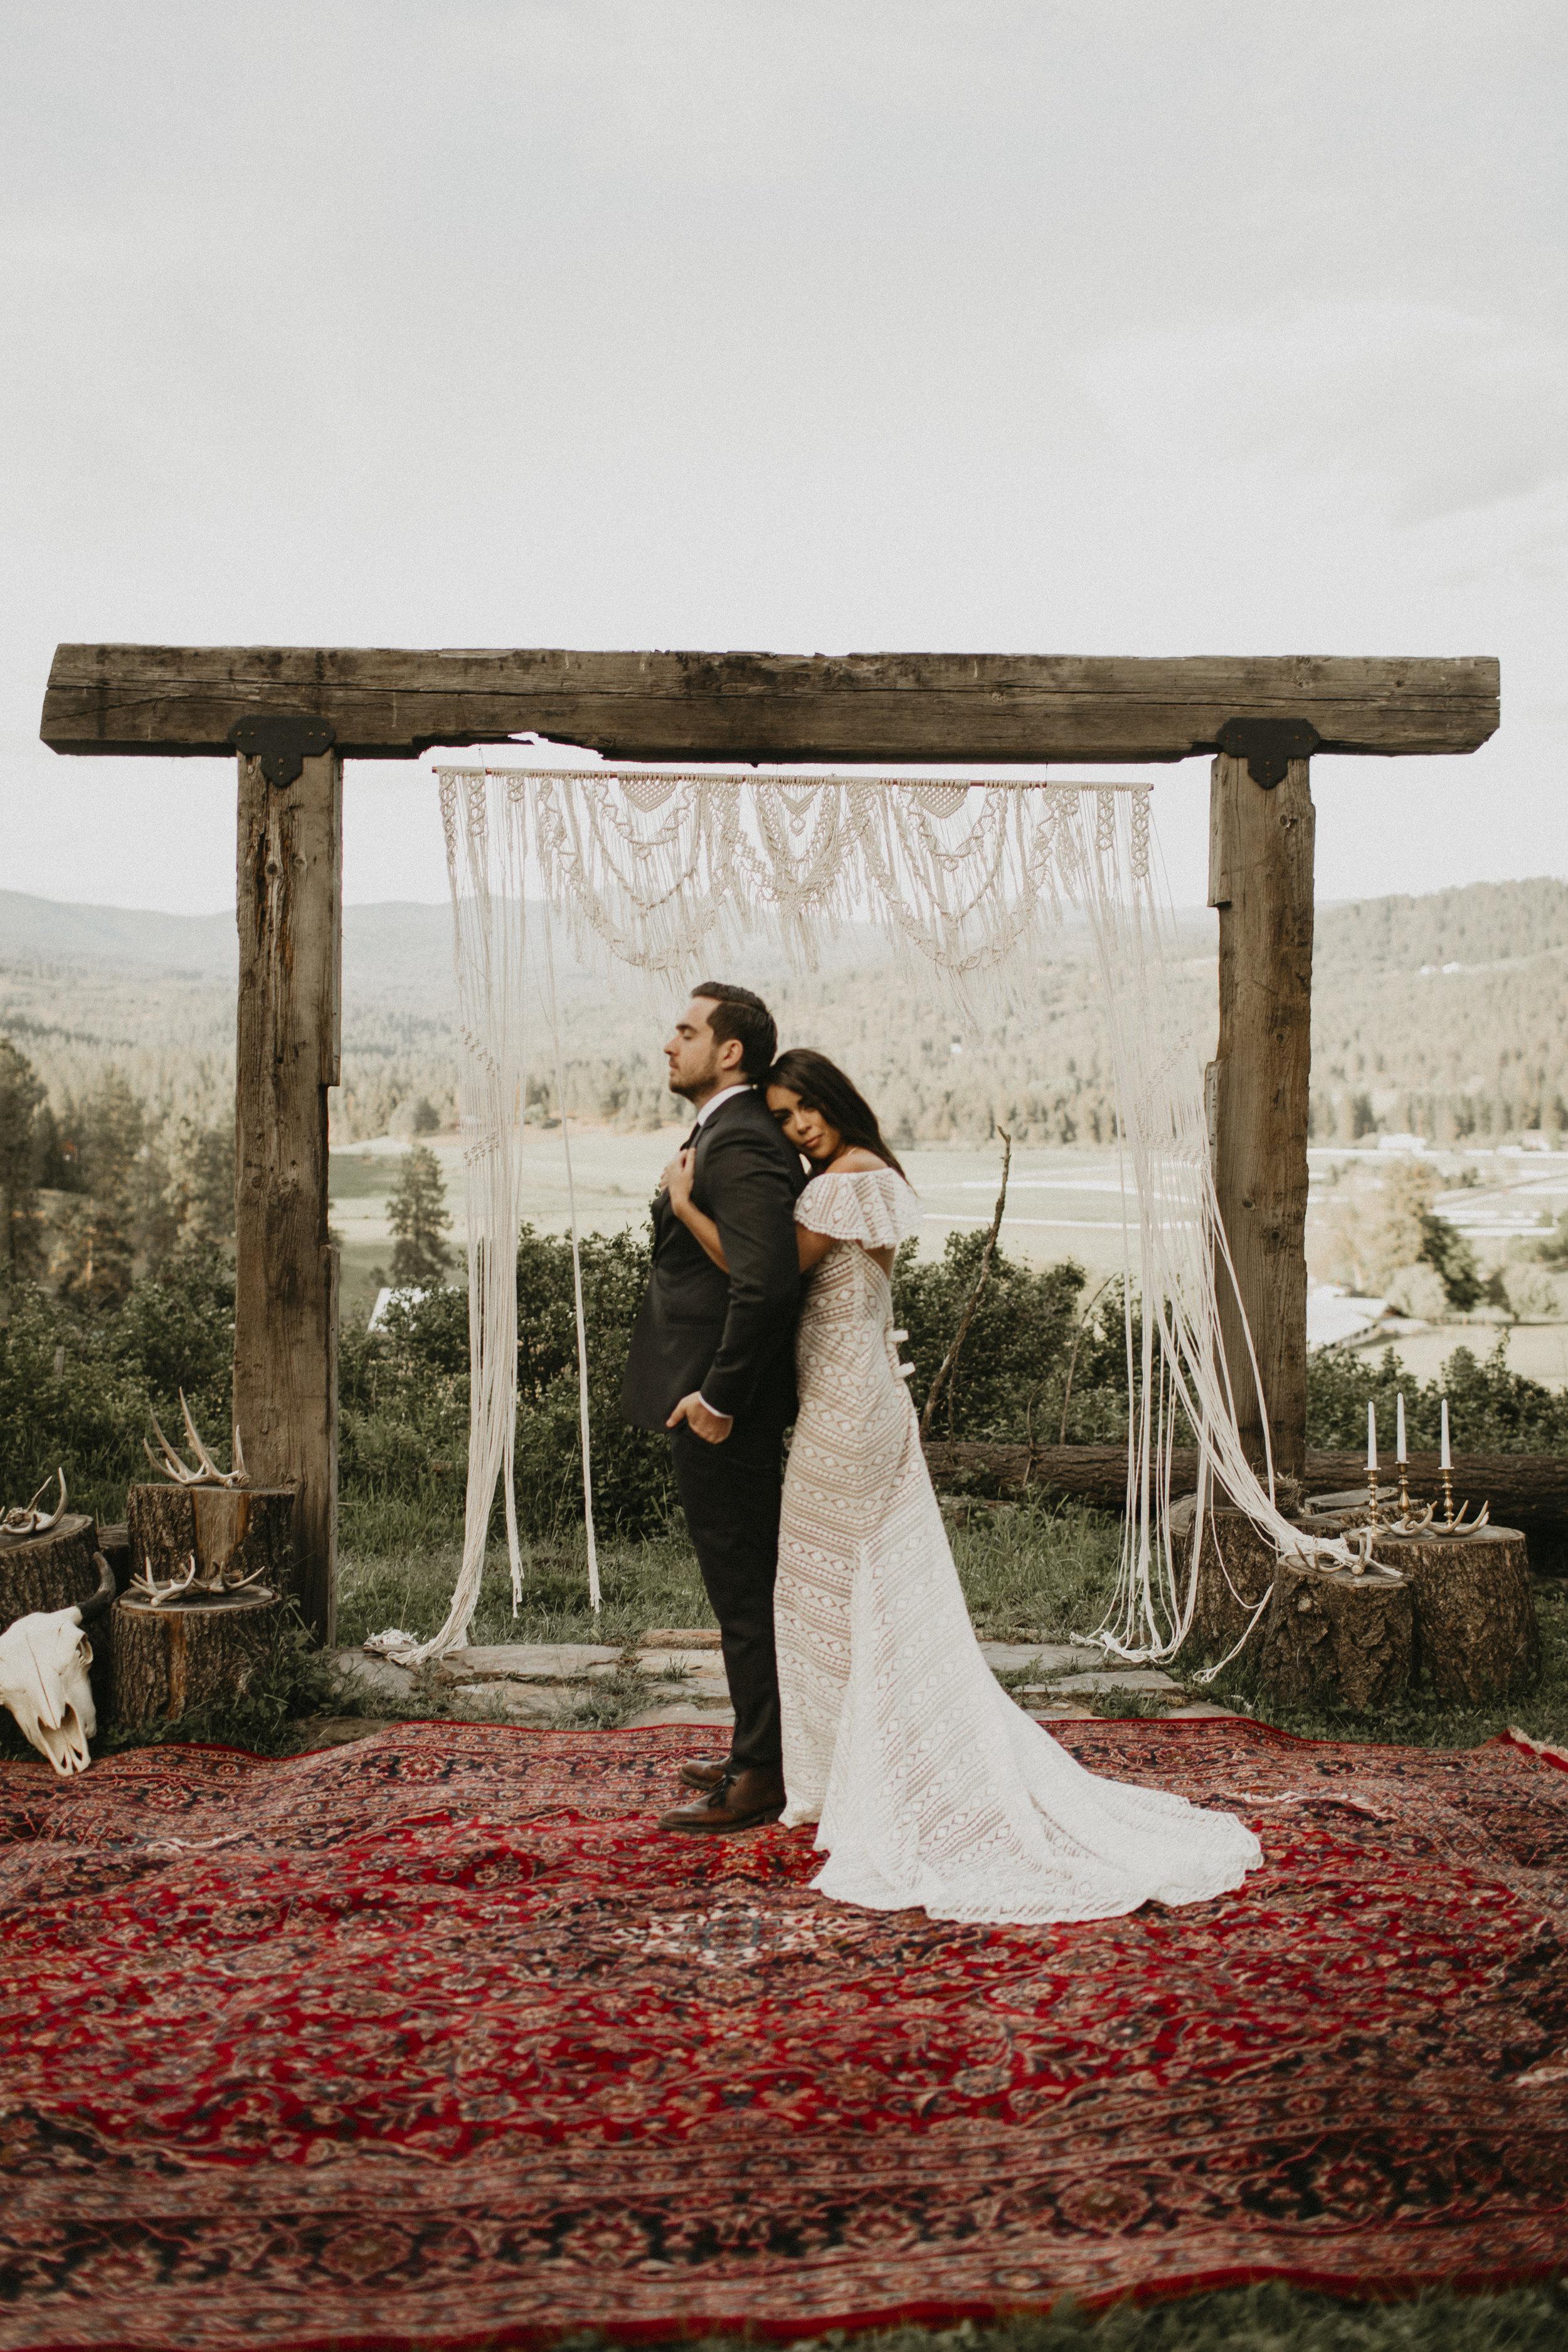 Spokane boho cattle wedding bride hugging groom candles romantic